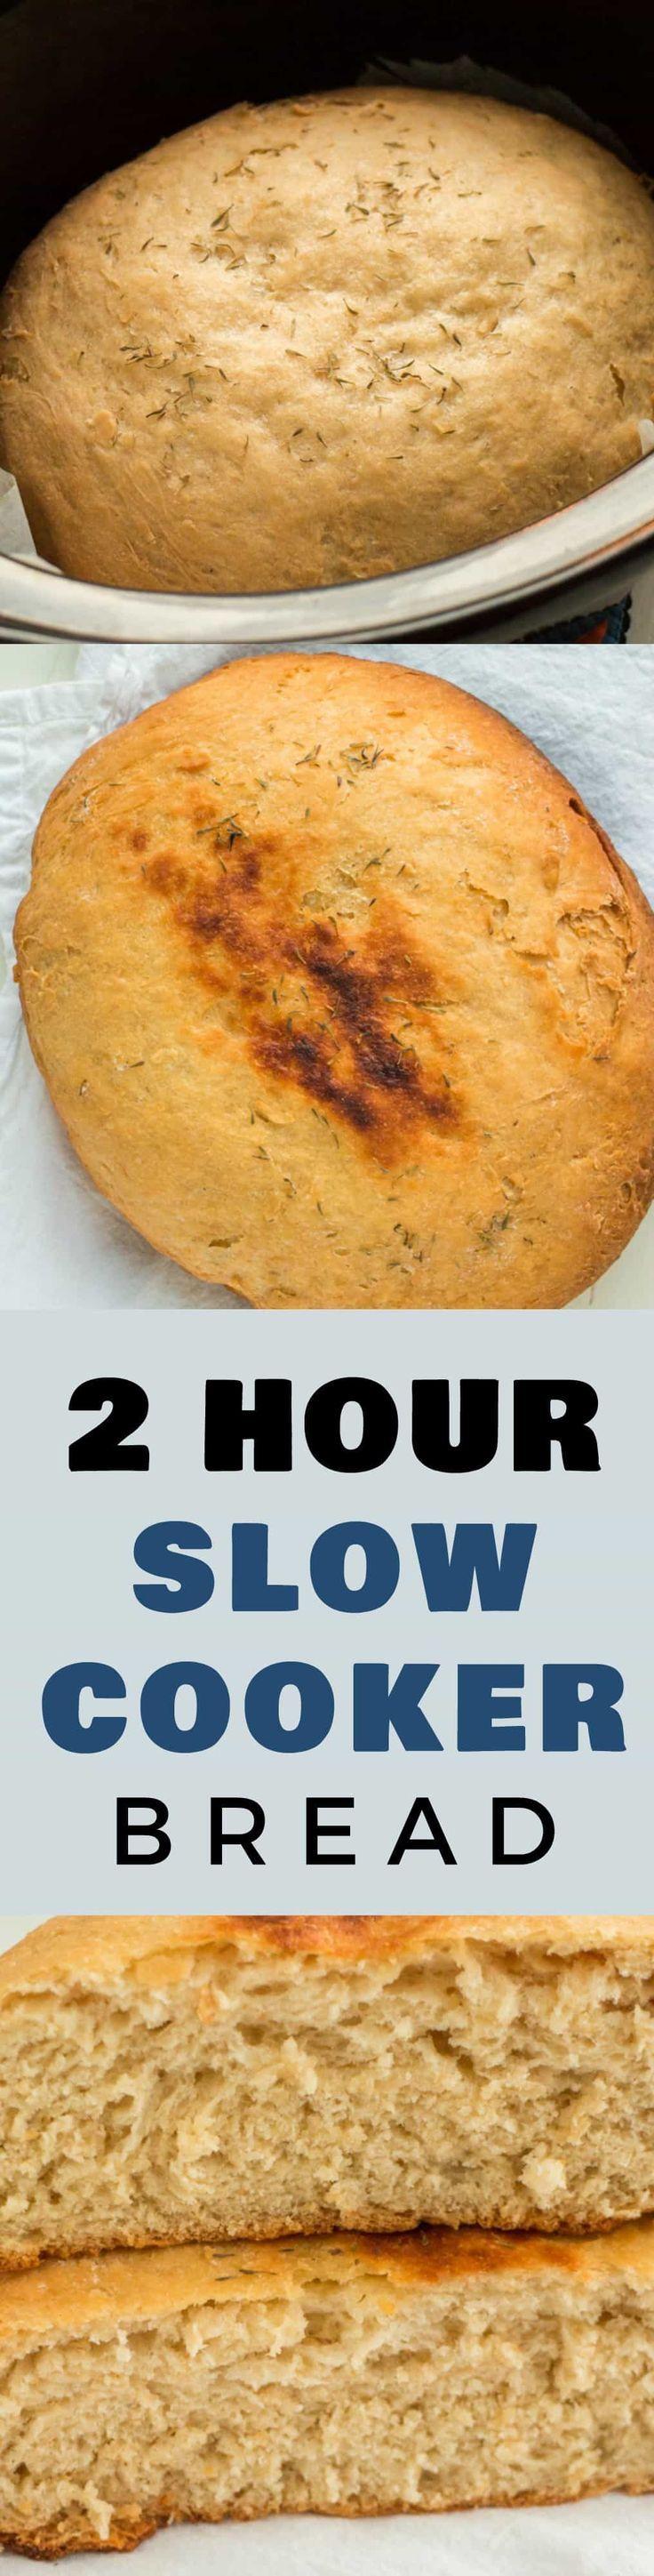 2 HOUR Crockpot Bread